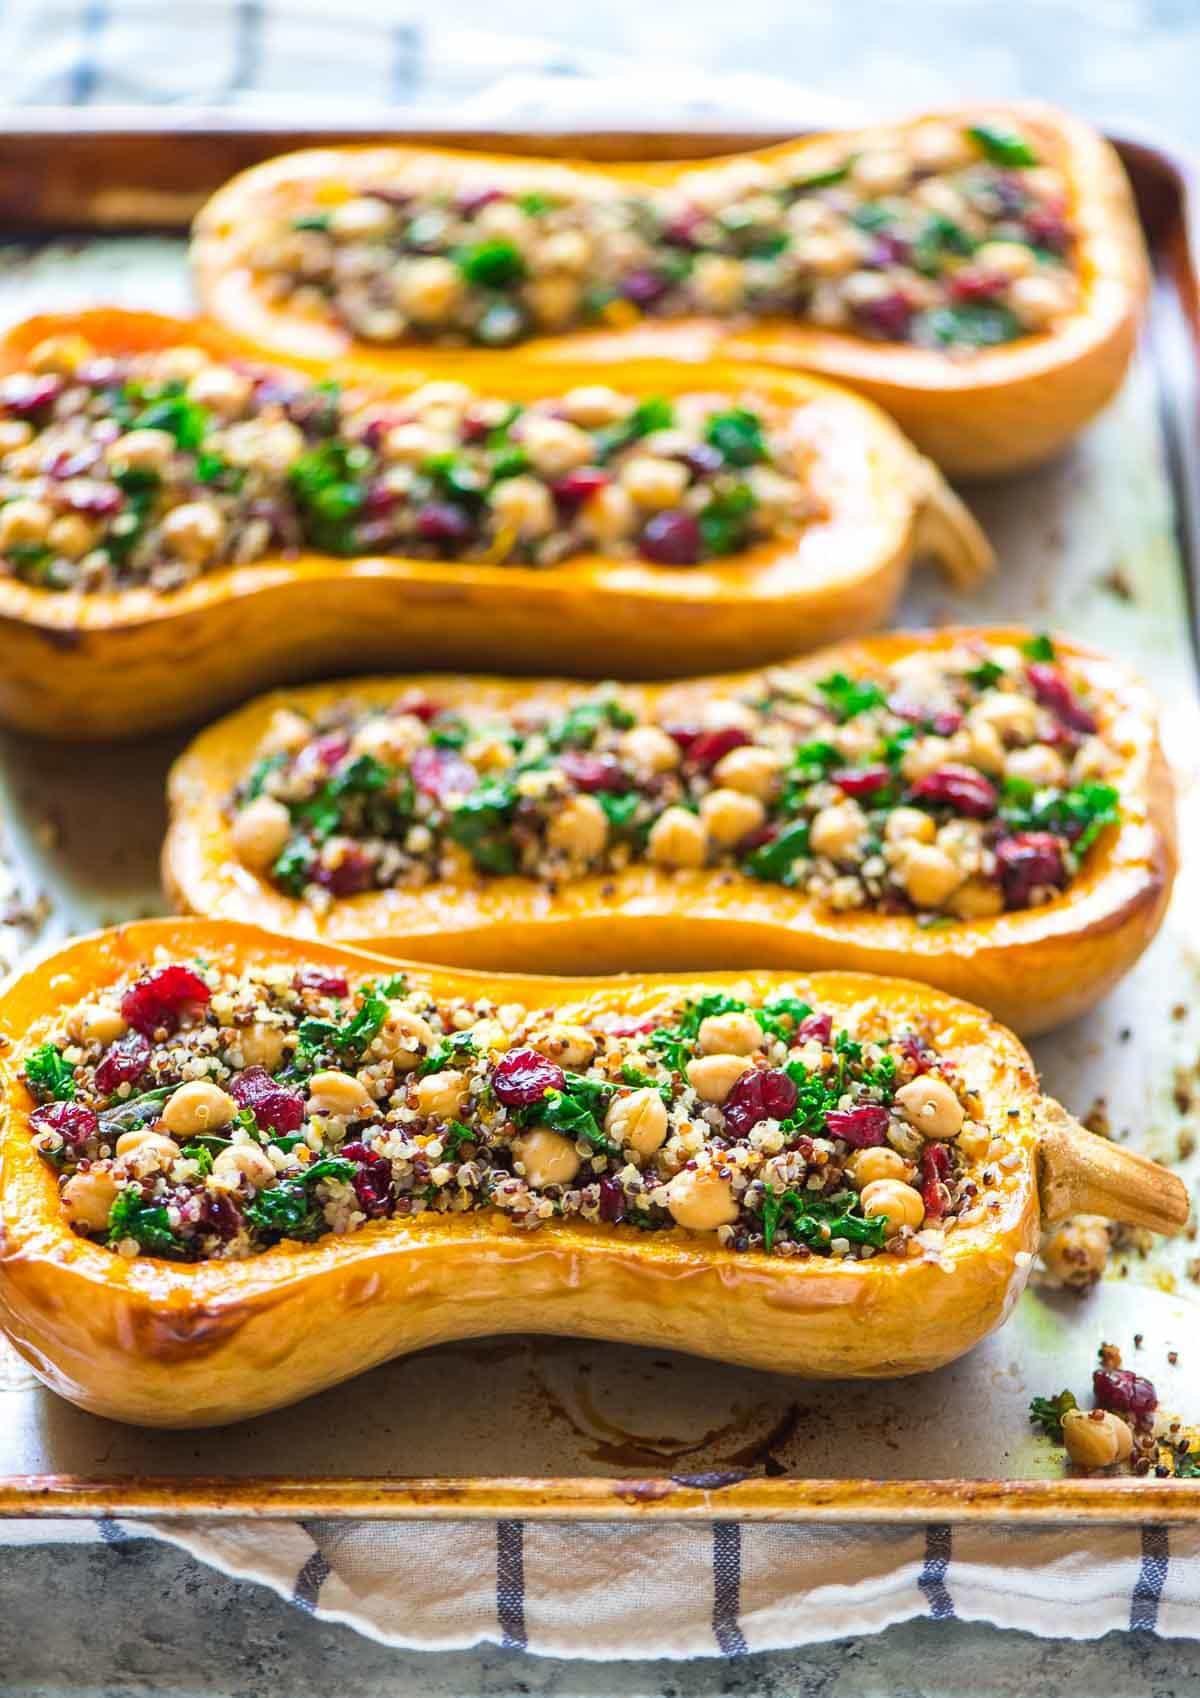 Vegetarian Fall Recipes  Quinoa Stuffed Butternut Squash with Cranberries and Kale